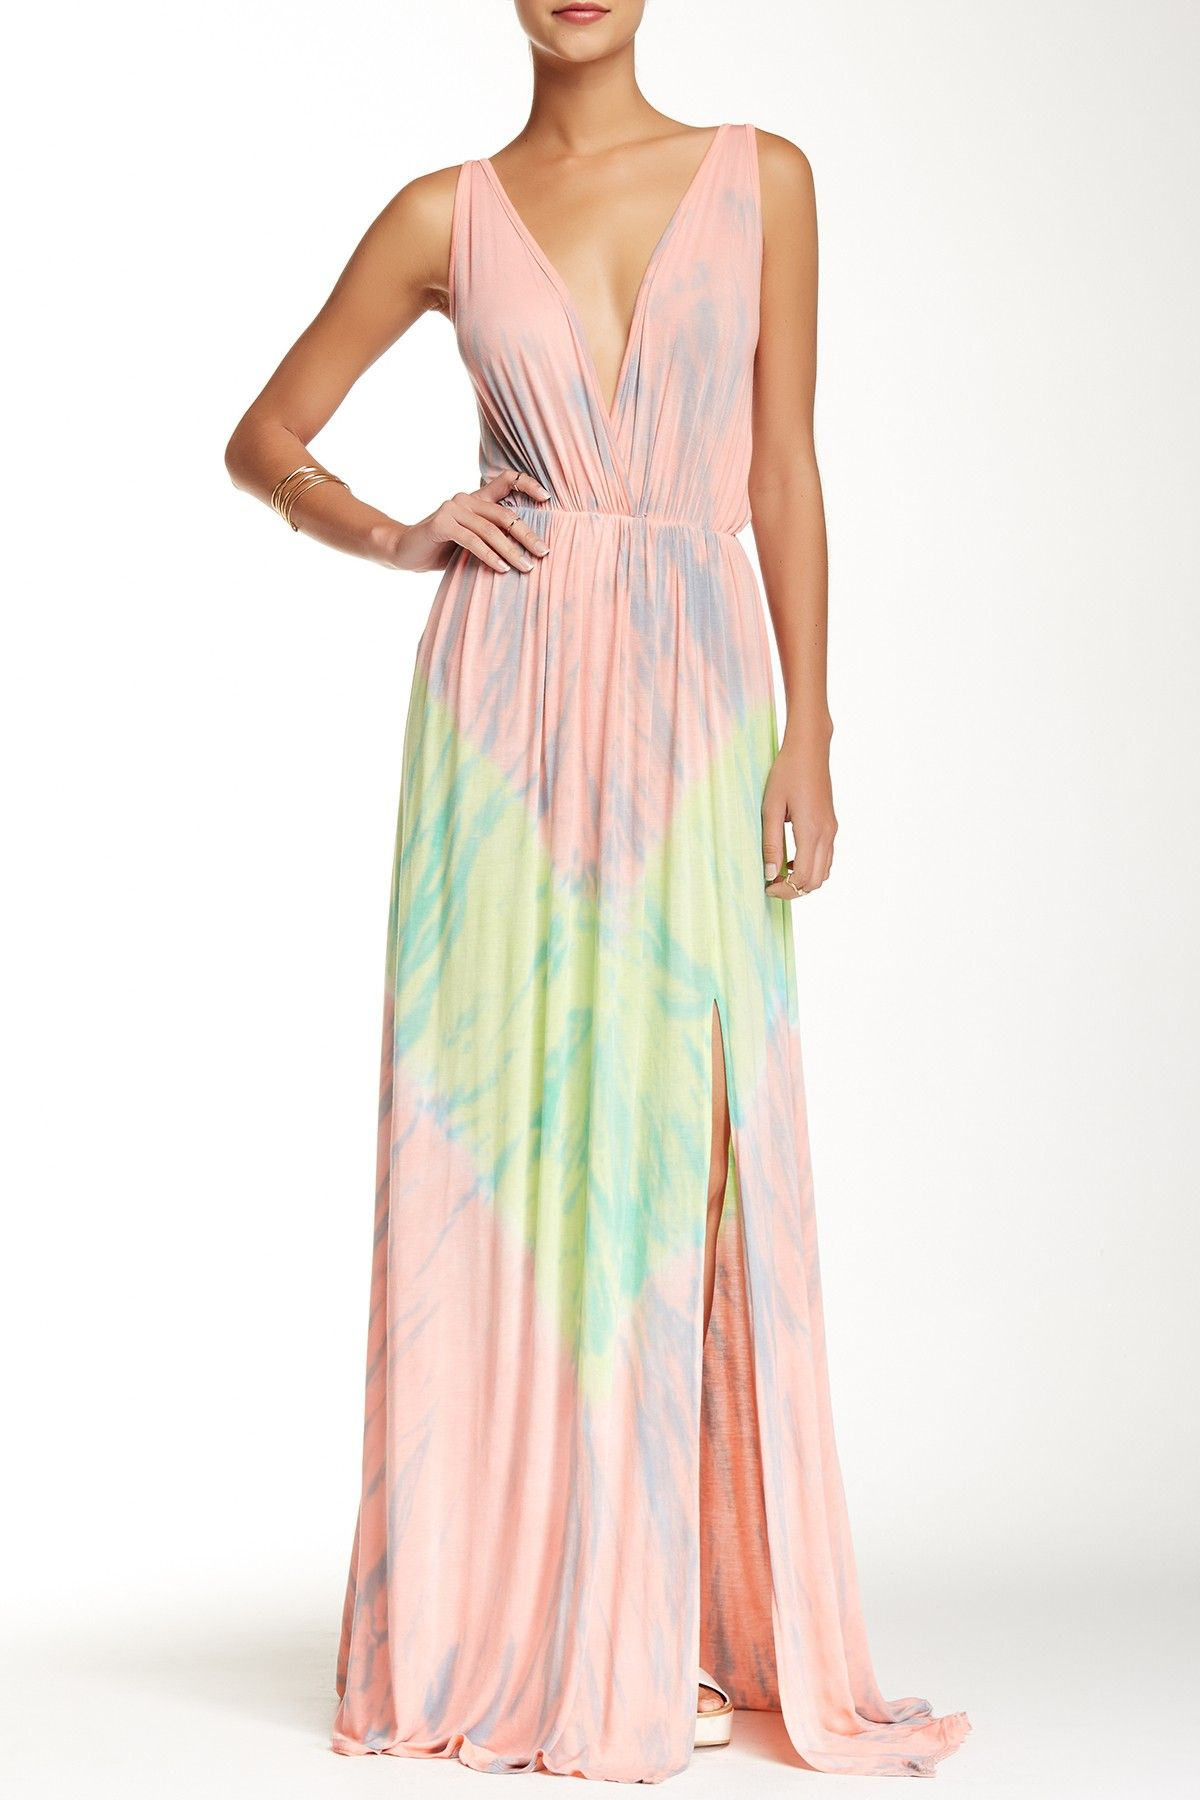 ebda246952 Beautiful Pastel Tie Dye Maxi Dress